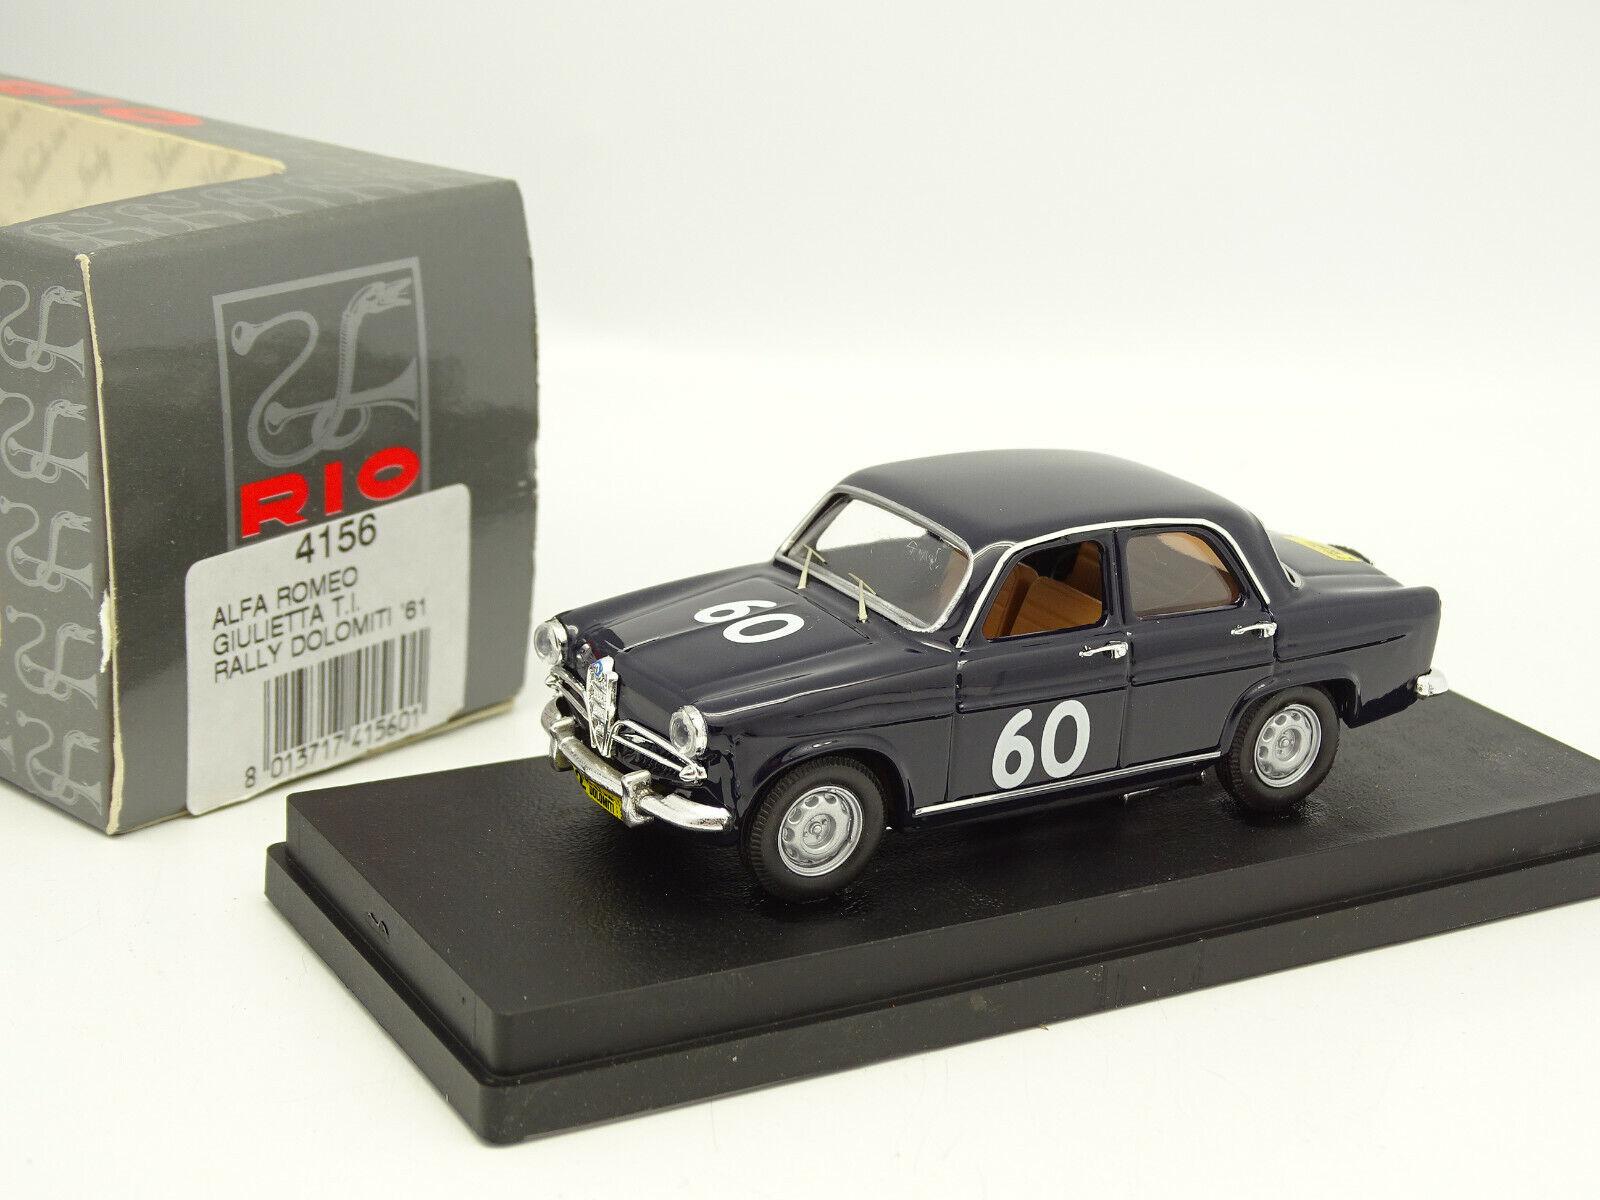 Rio 1 43 - Alfa Romeo Giulietta TI Rally of of of Dolomites 1961 328151